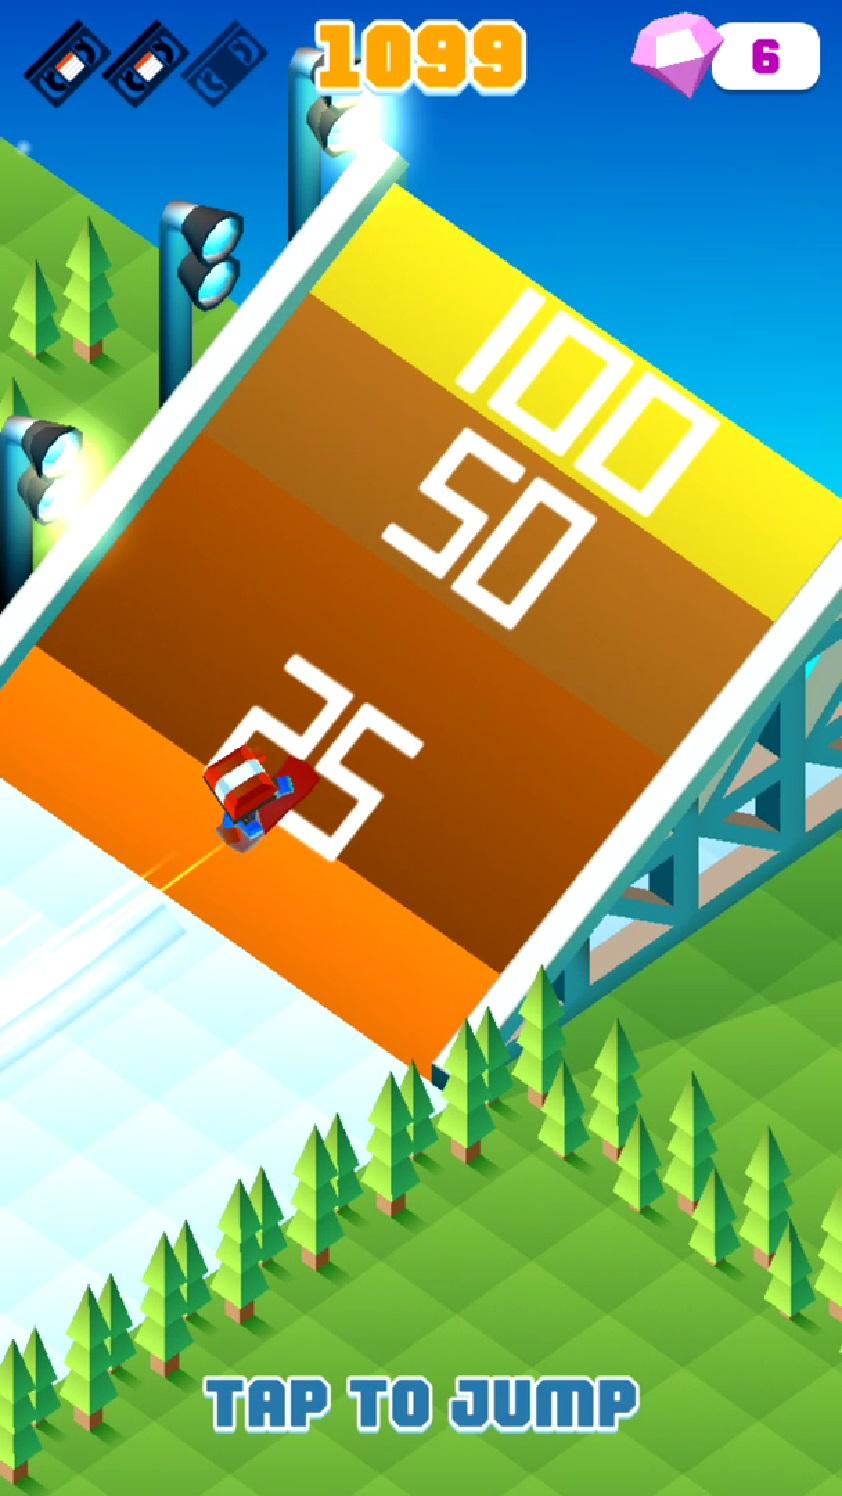 androidアプリ Blocky Snowboarding攻略スクリーンショット3